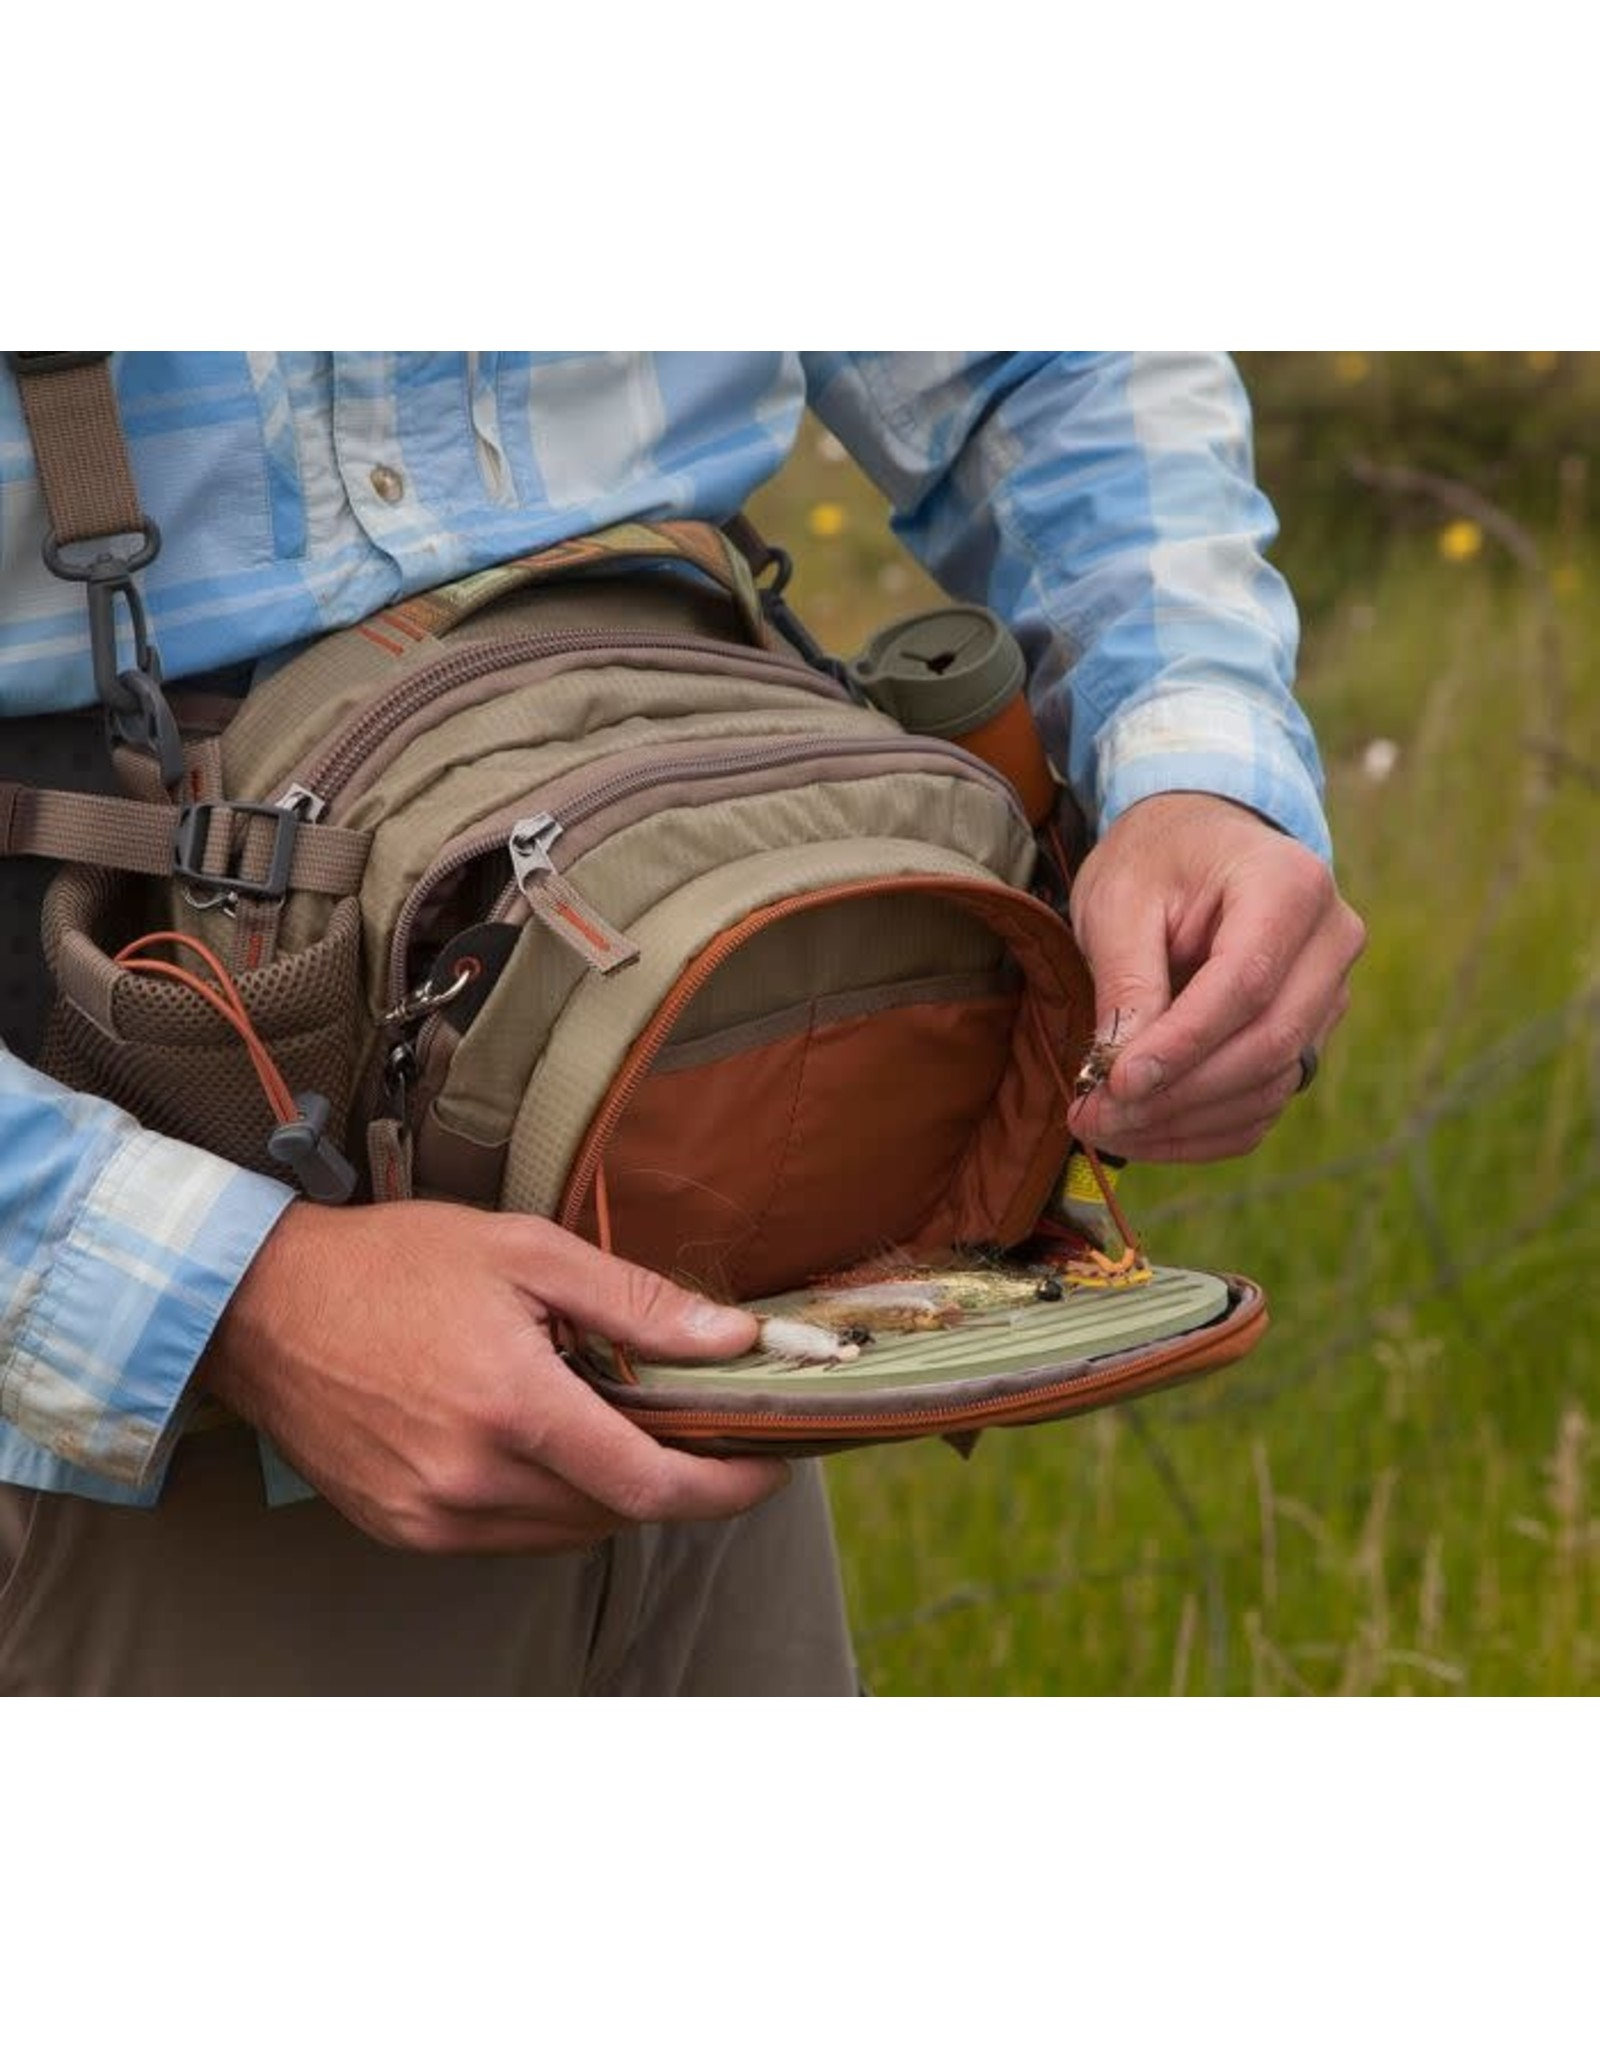 Fishpond Waterdance Guide Pack - Driftwood